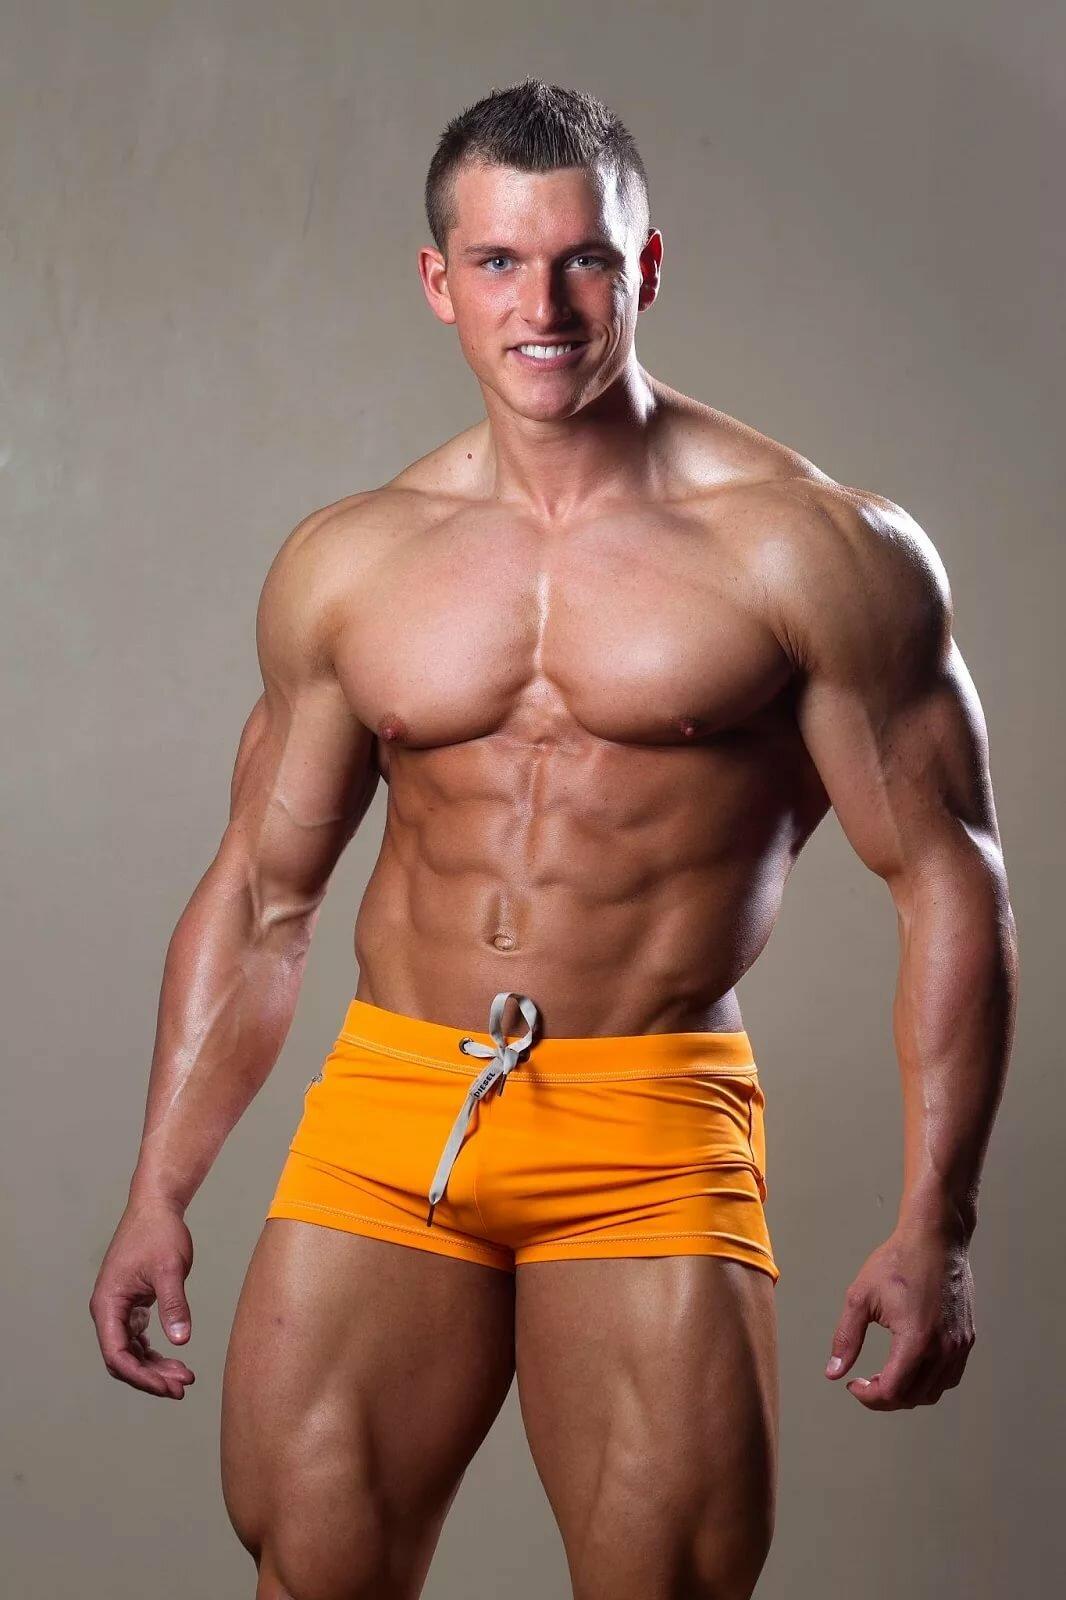 Alexi texis bisexual body builders